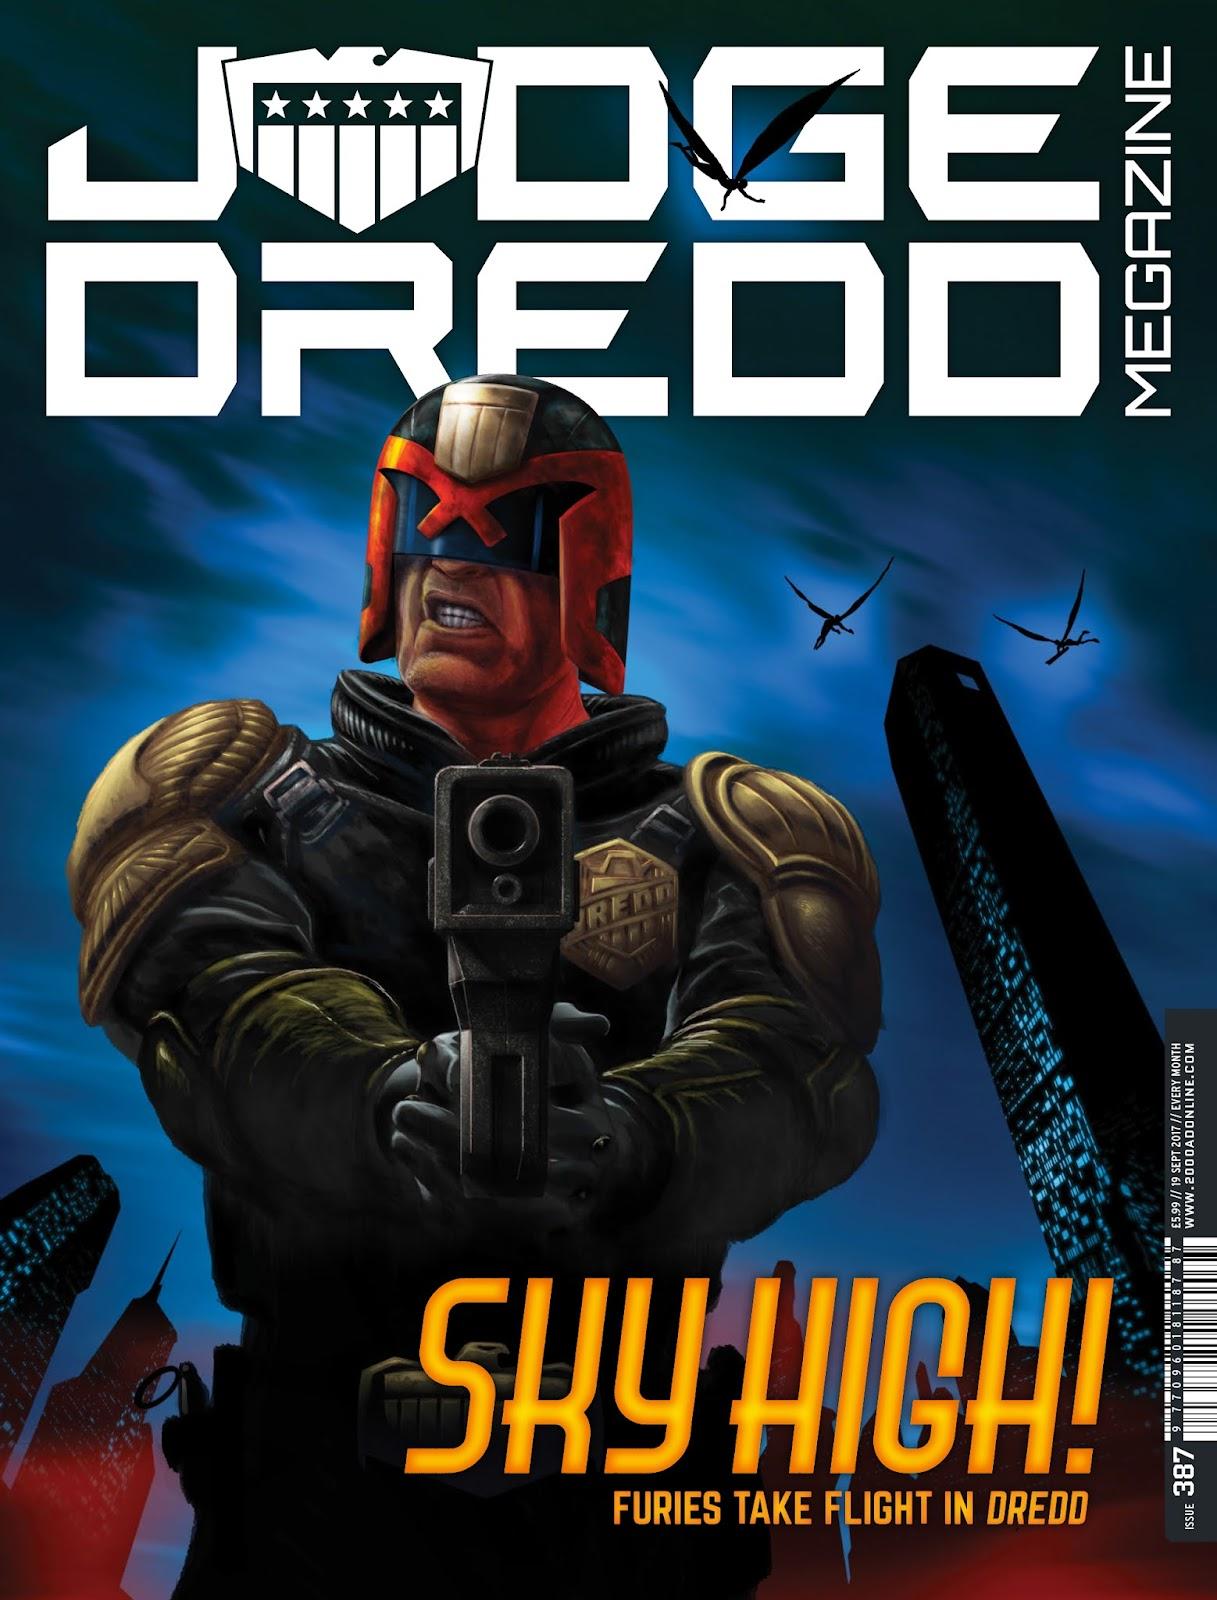 Judge Dredd Megazine (Vol. 5) issue 387 - Page 1